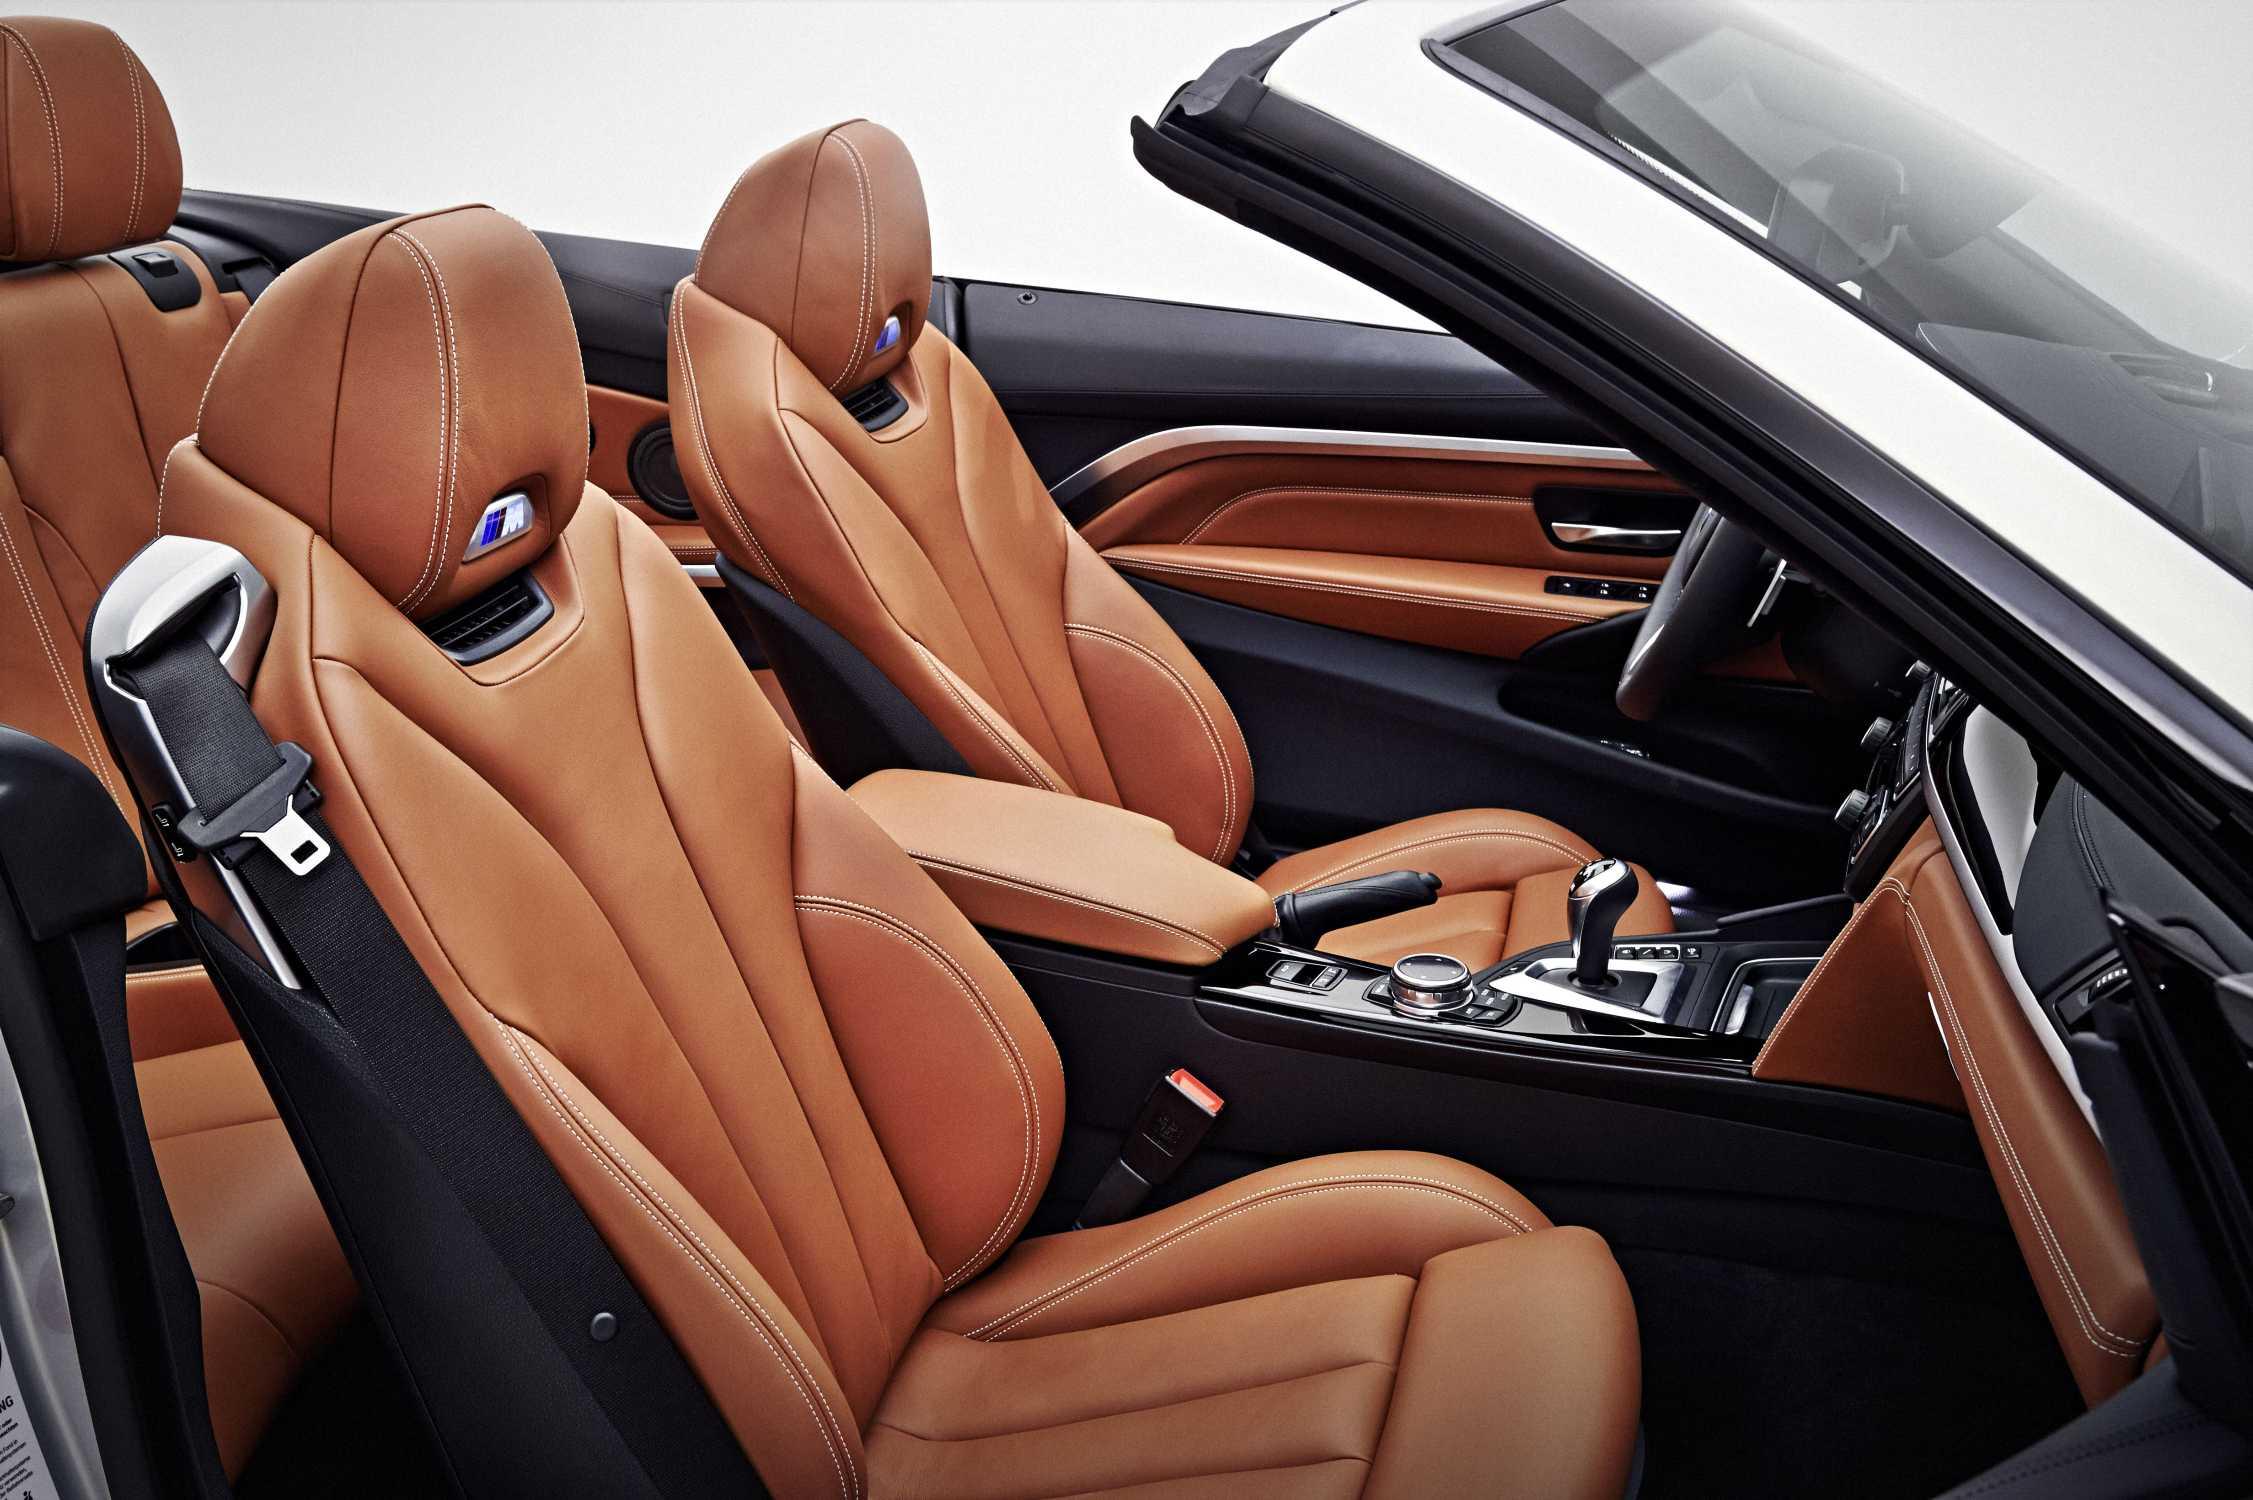 Bmw M4 Convertible Bmw Individual Moonstone Metallic Interior In Bmw Individual Full Leather